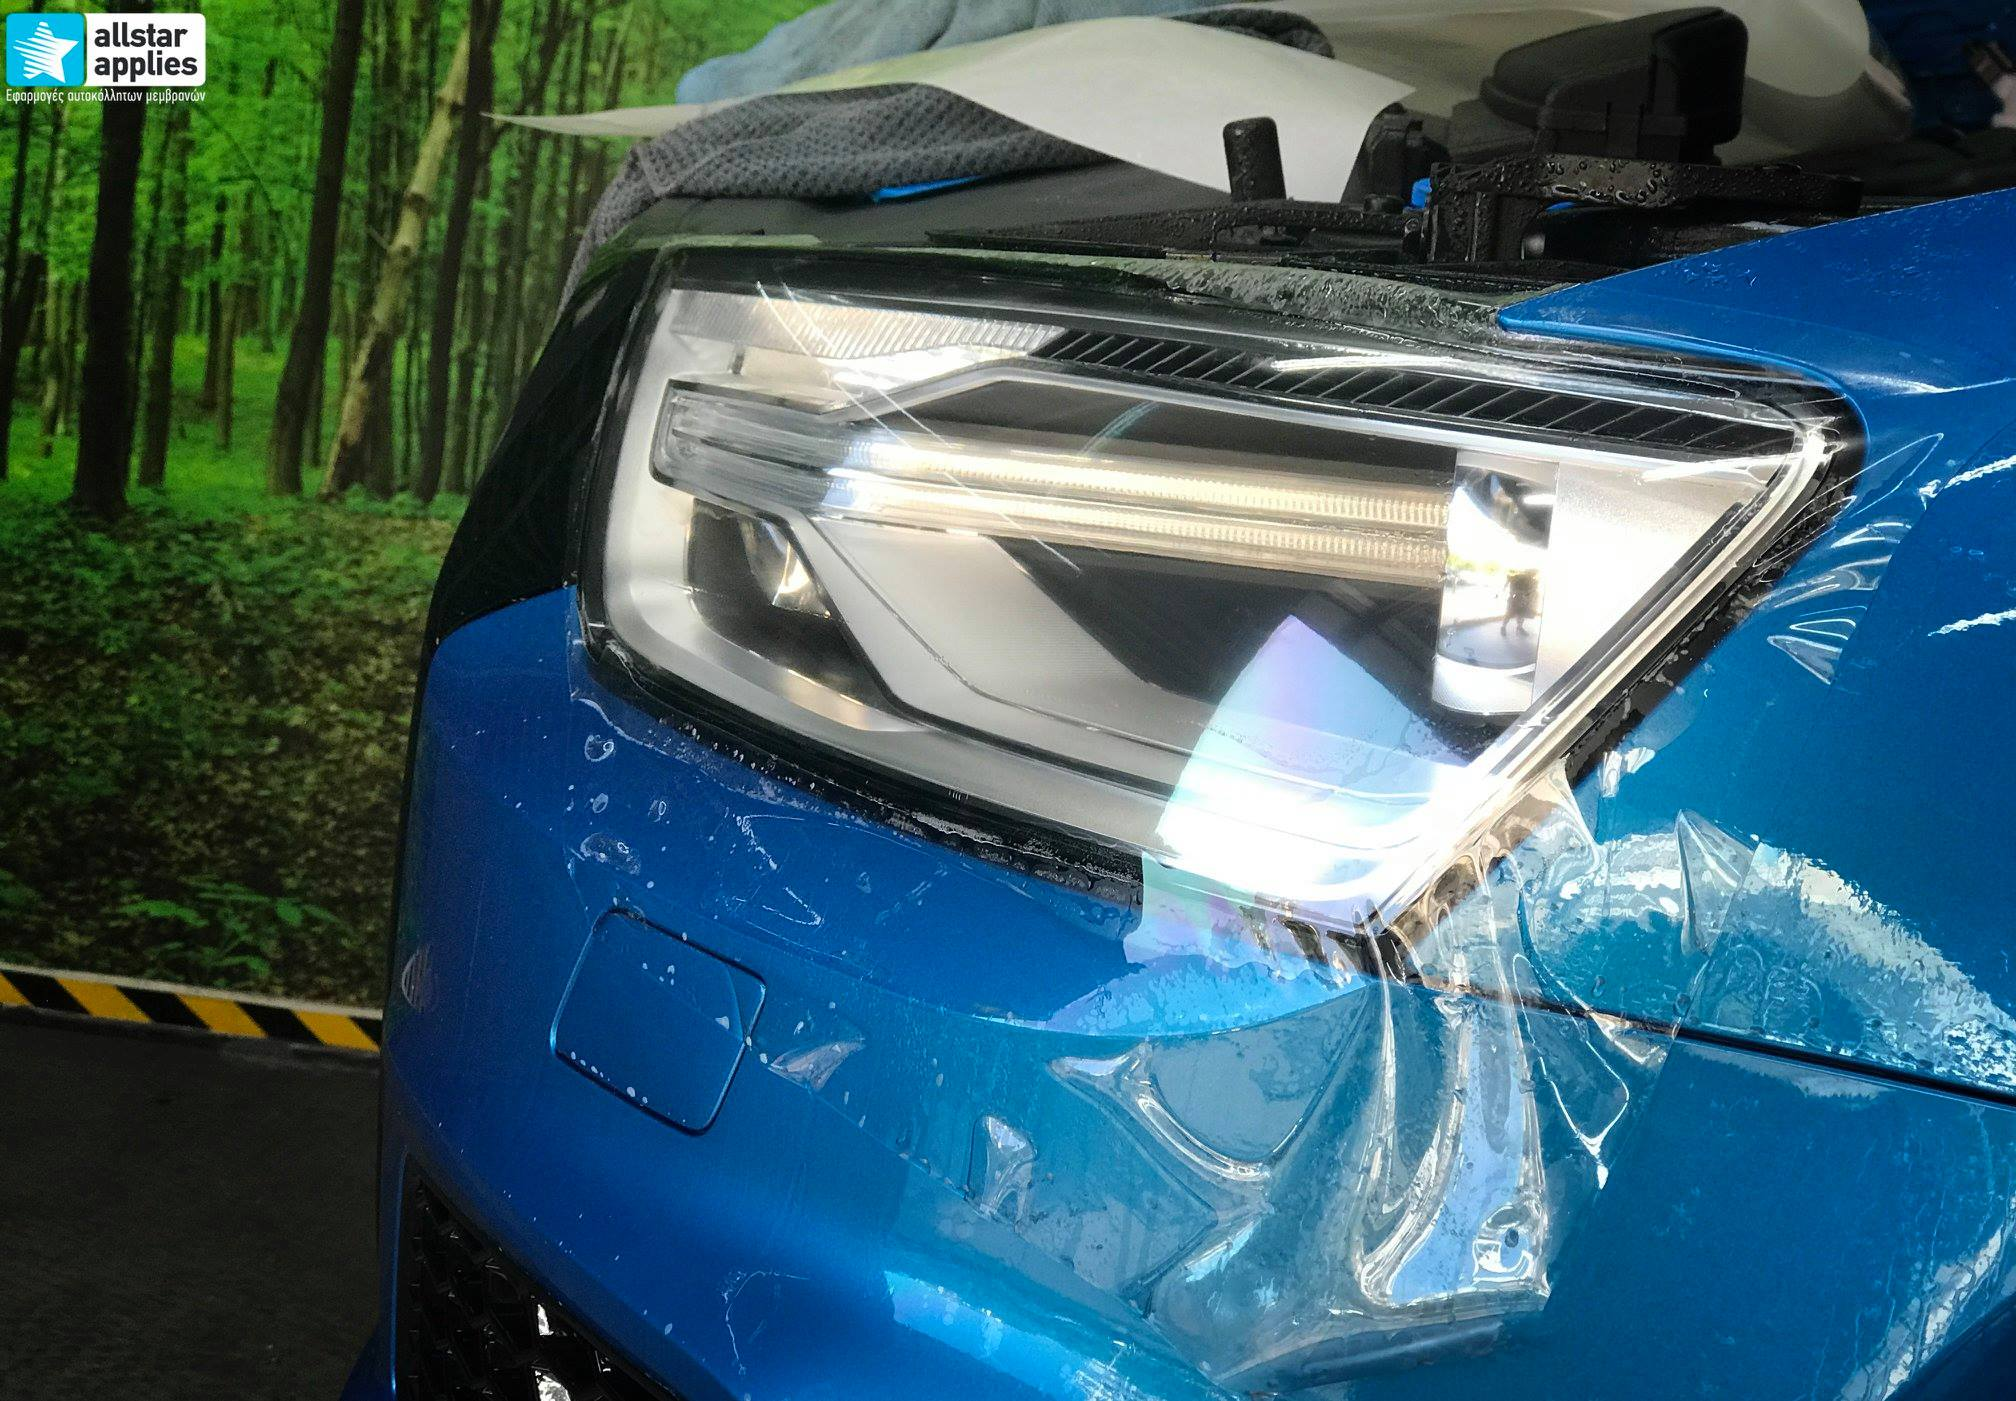 Audi Q3 – Μεμβράνες προστασίας χρώματος (Full Paint Protection Film) (7)